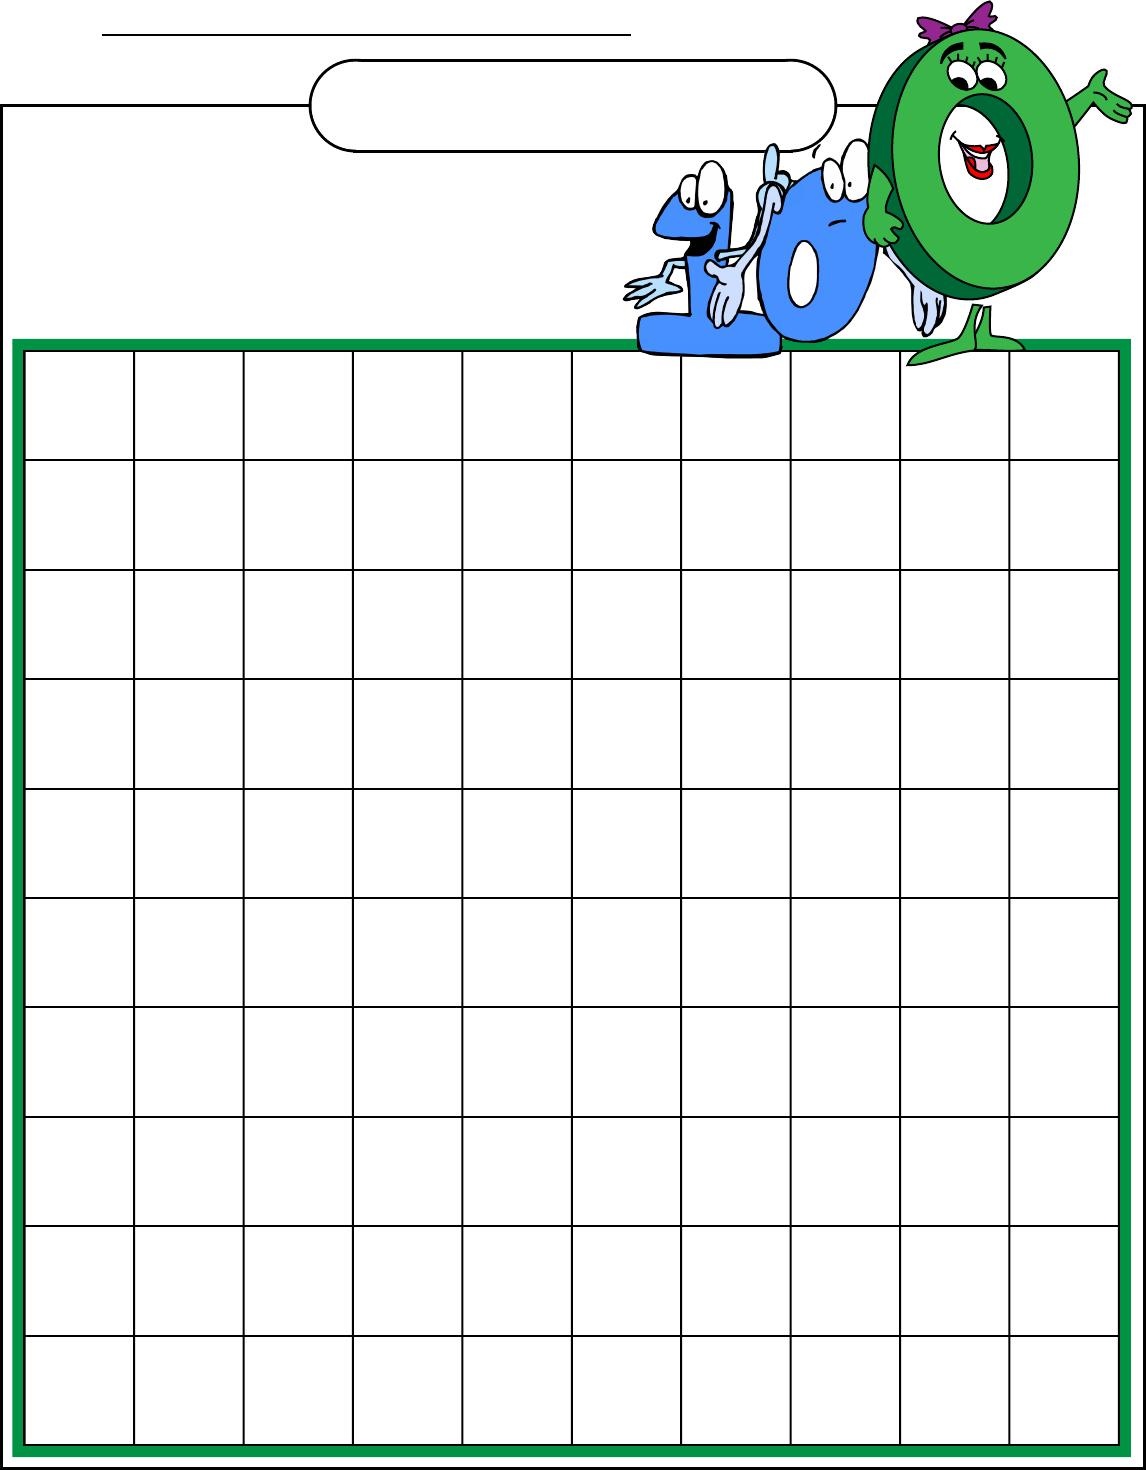 Free Hundreds Chart Blank - PDF | 162KB | 1 Page(s)